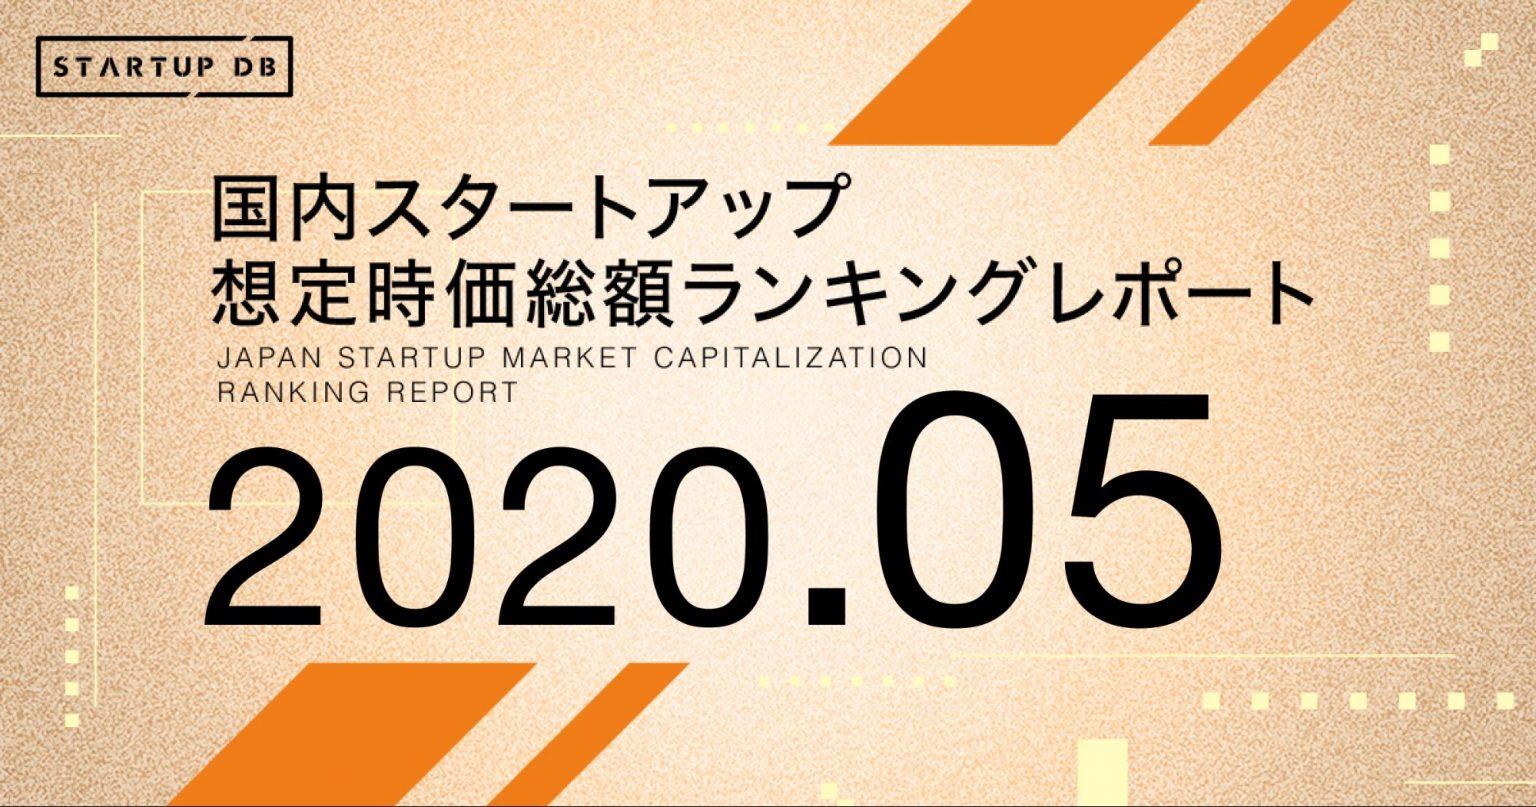 【STARTUP DB】調査結果 国内スタートアップ想定時価総額ランキング(2020年5月) フィンテックのGVE、2500万ドルの資金調達に成功し、10位へランクイン